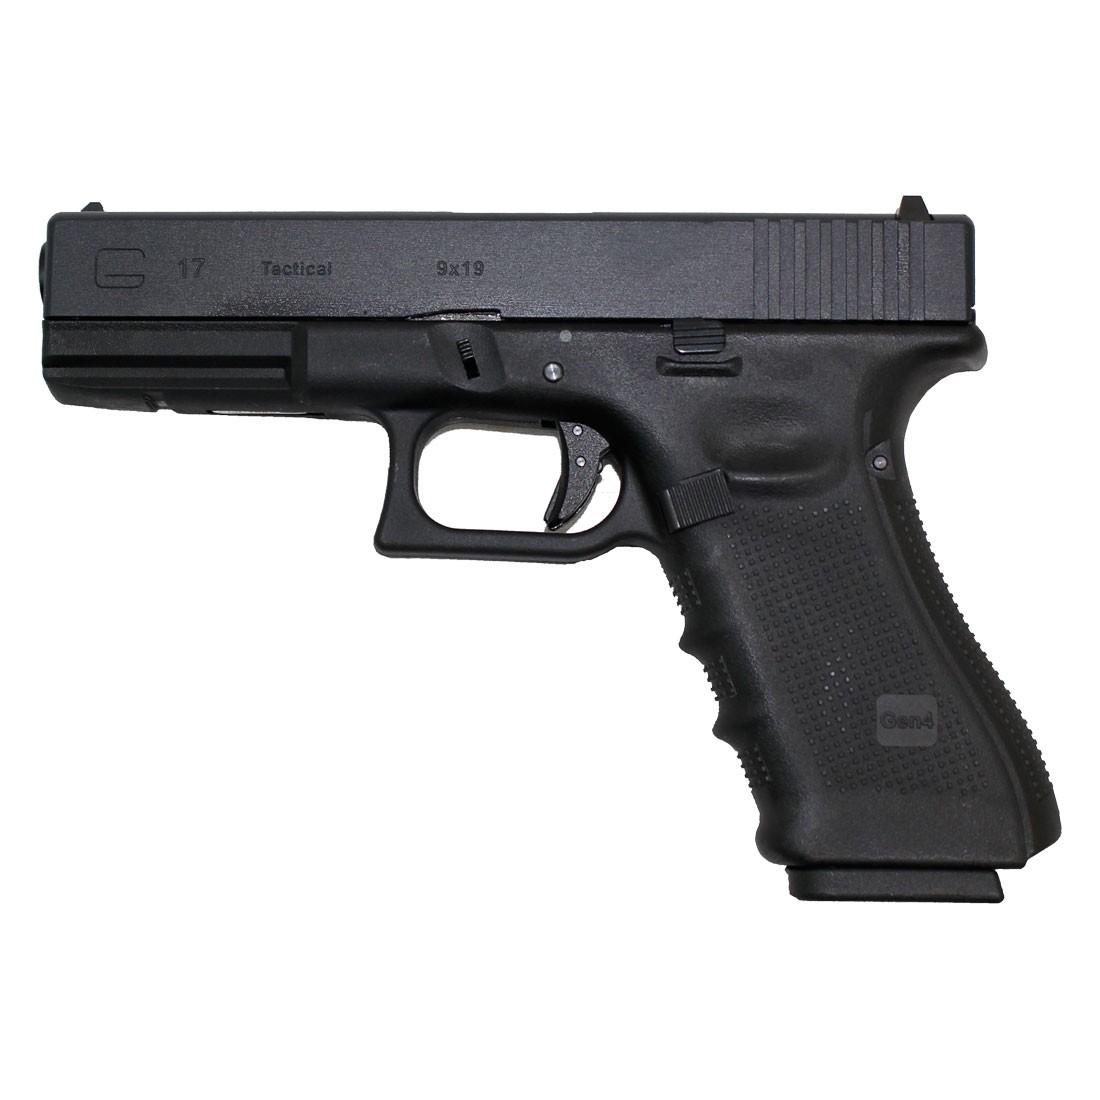 WE Glock 17 Gen 4 GBB Pistol (Black)